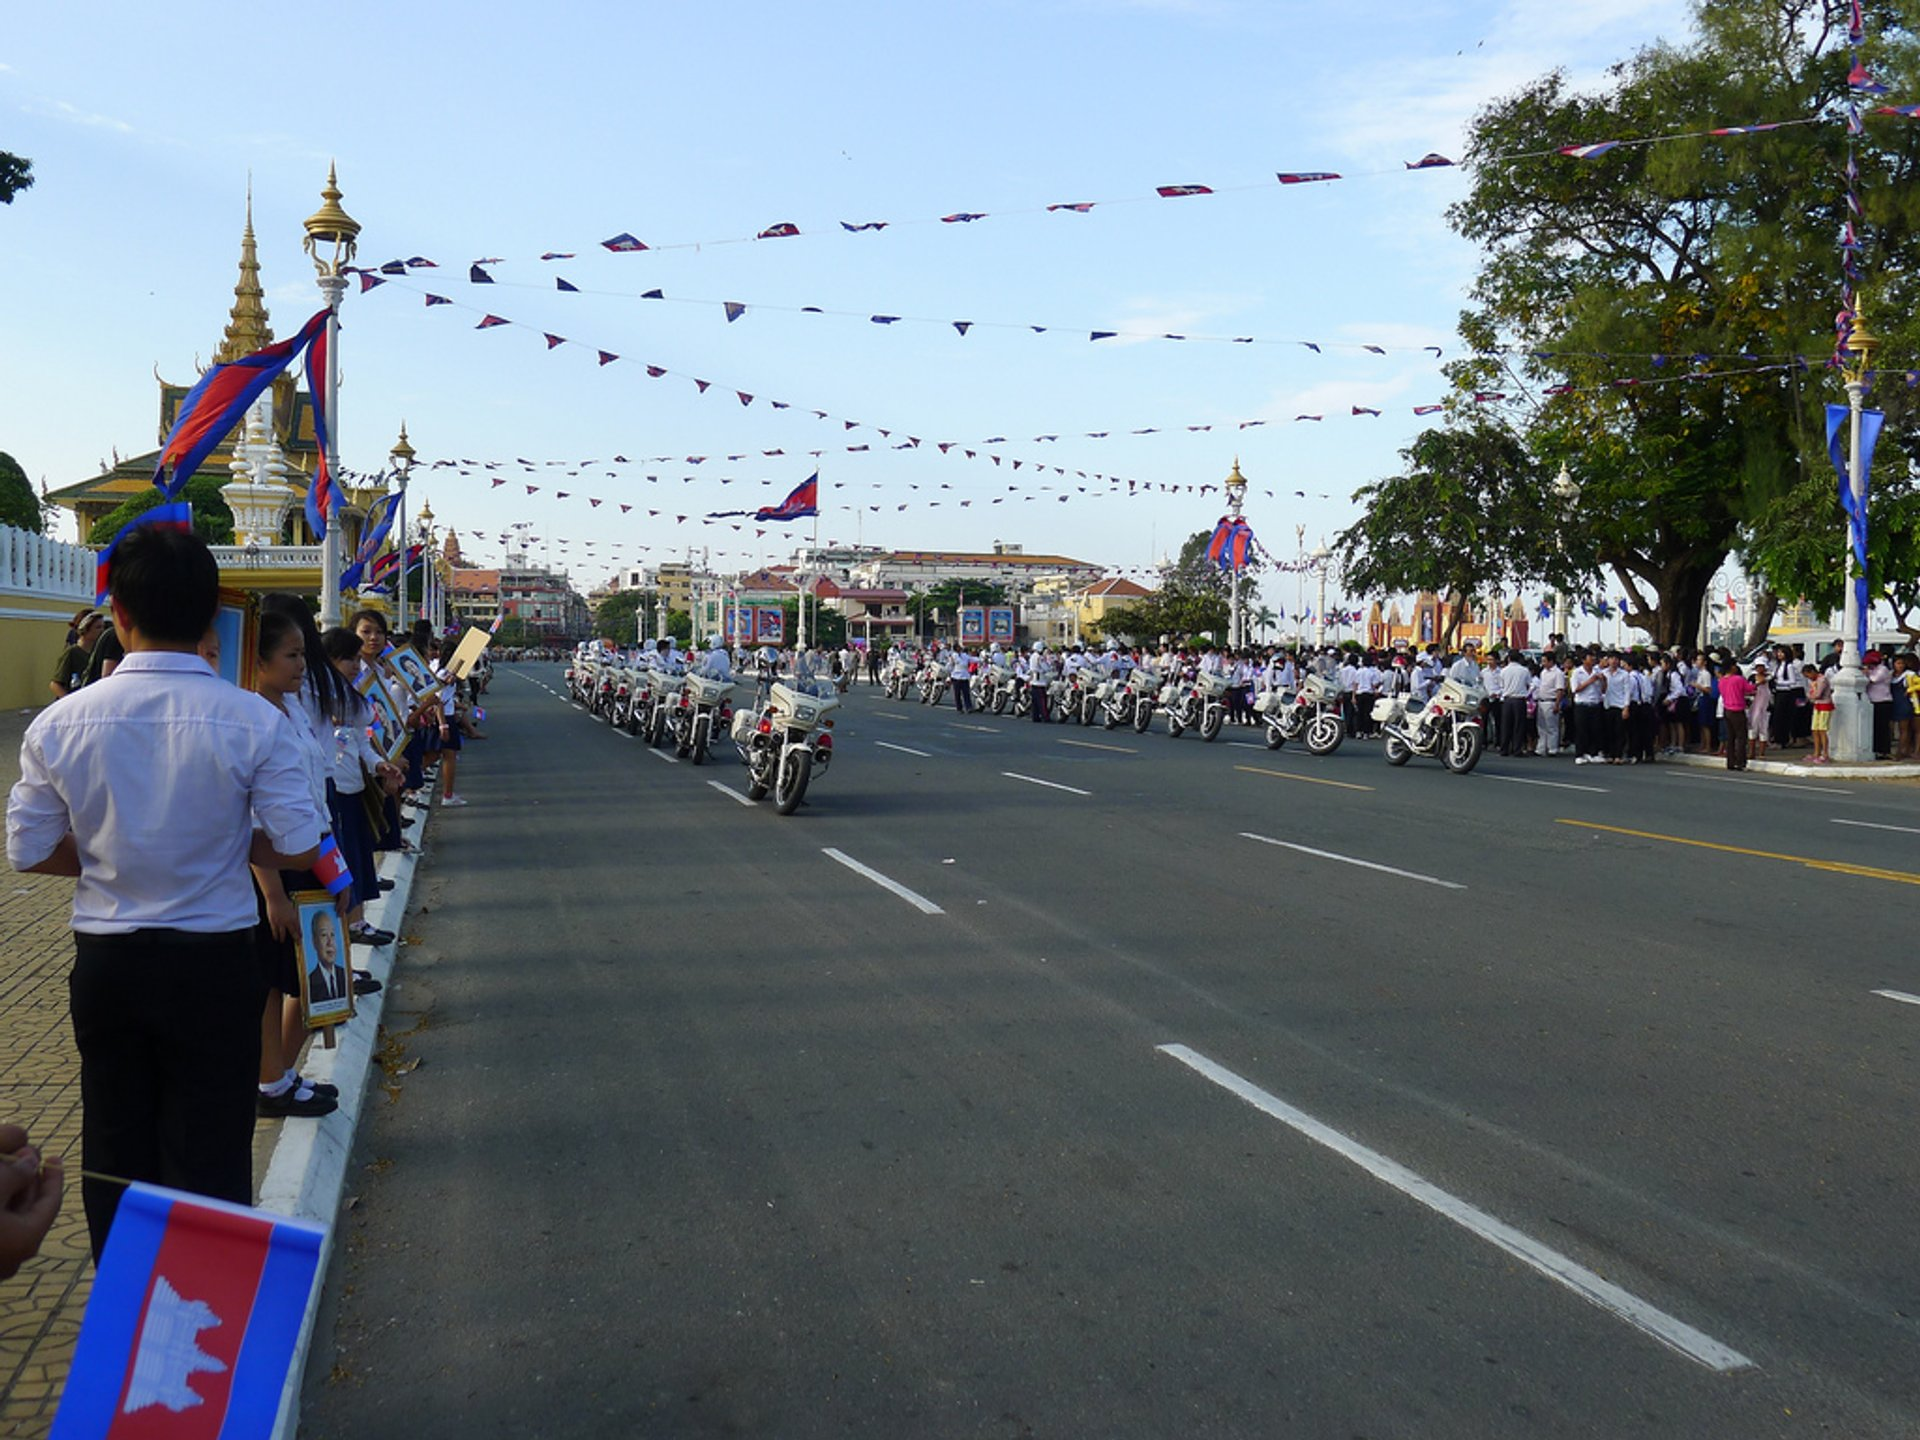 King's Birthday Celebration in Cambodia 2019 - Best Time